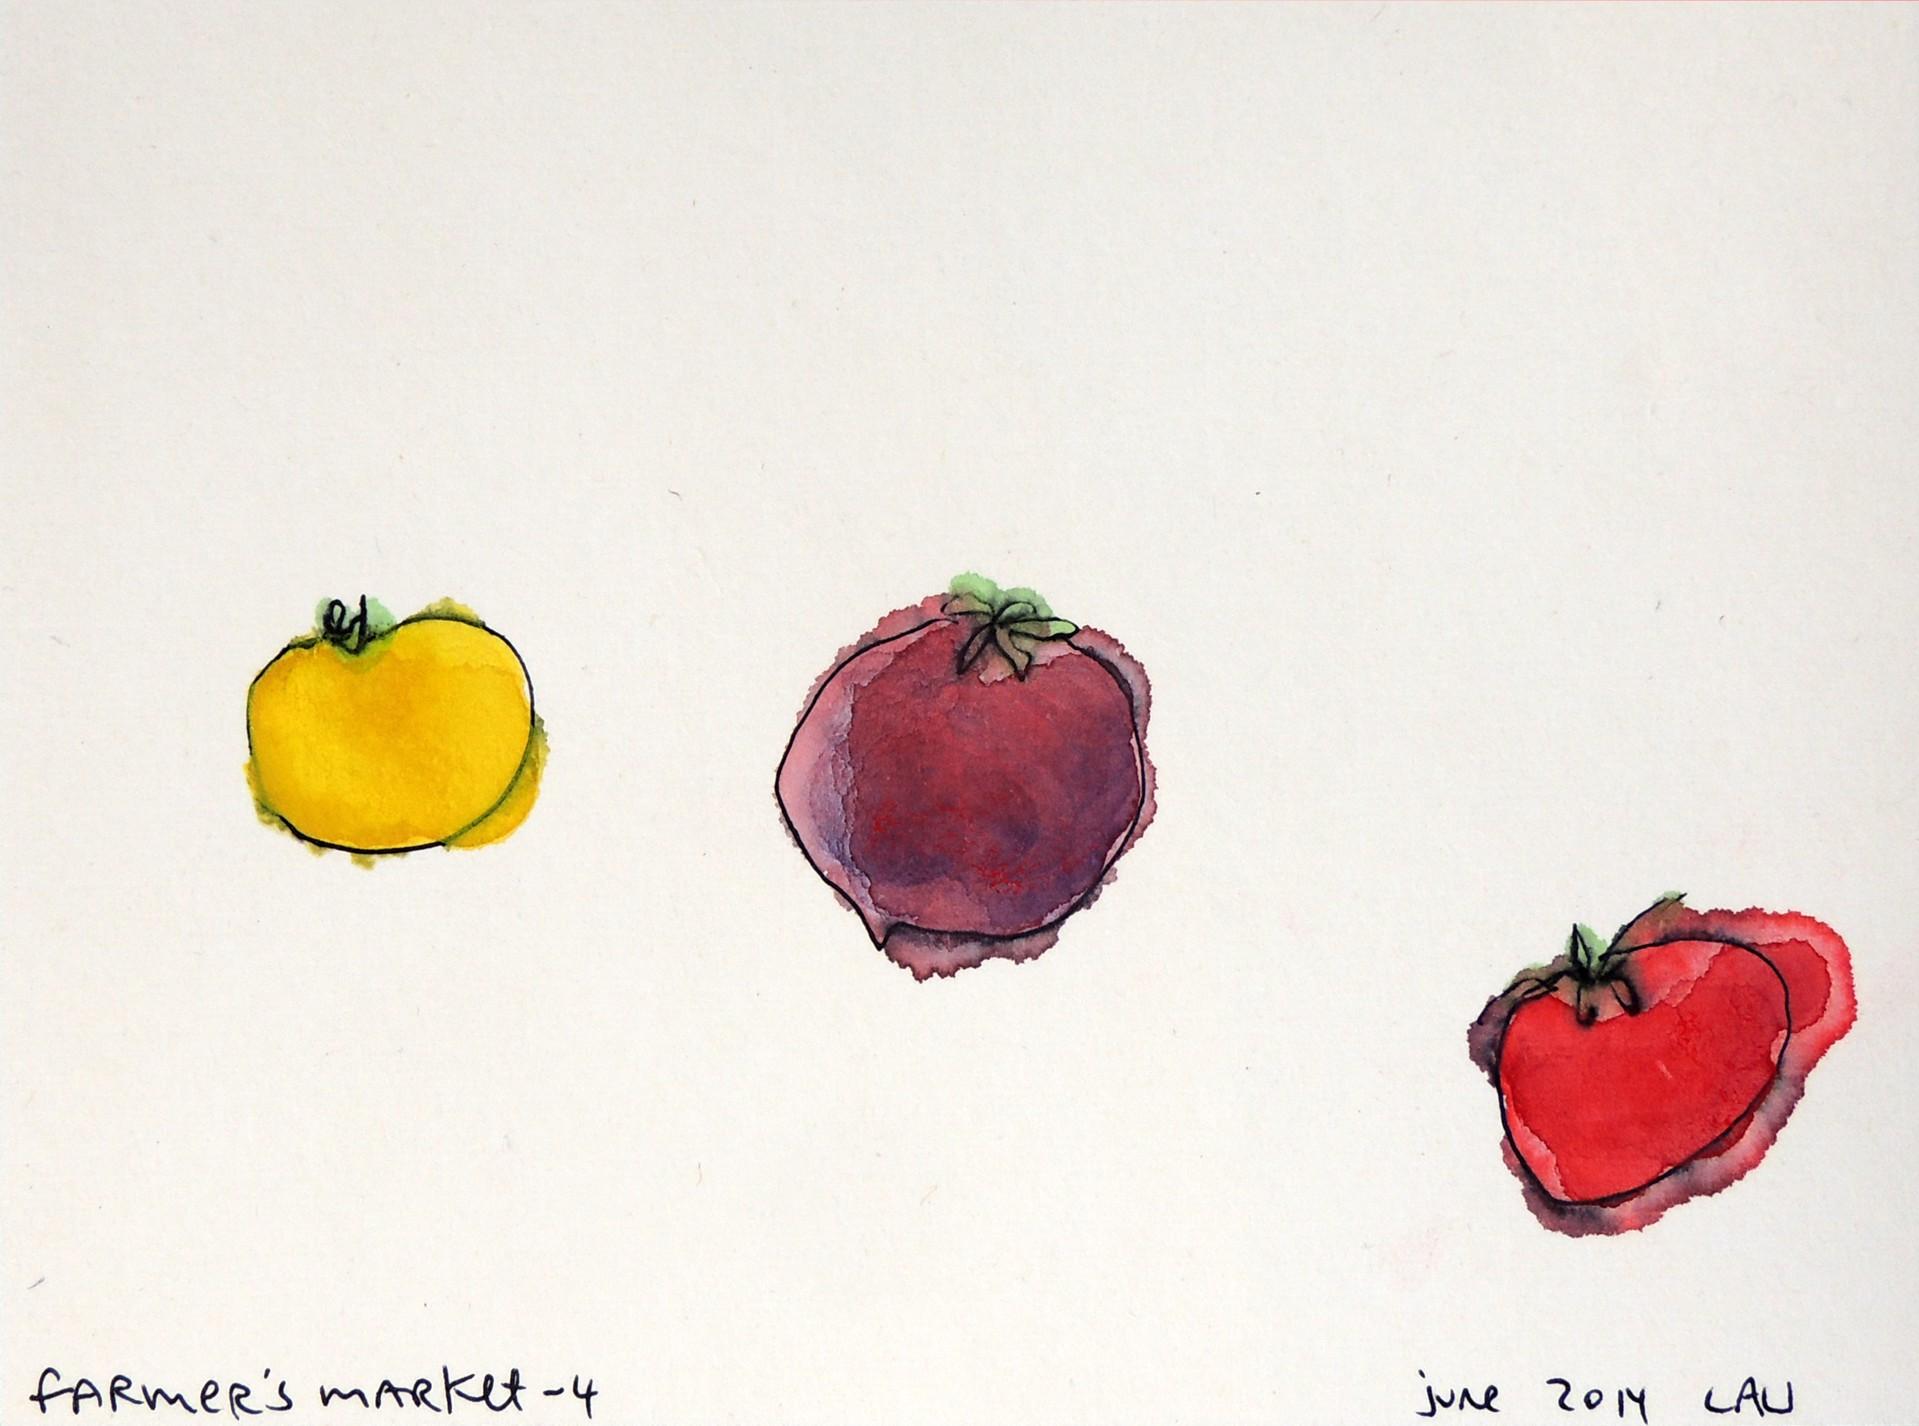 farmer's market 4 by Alan Lau | Small Works